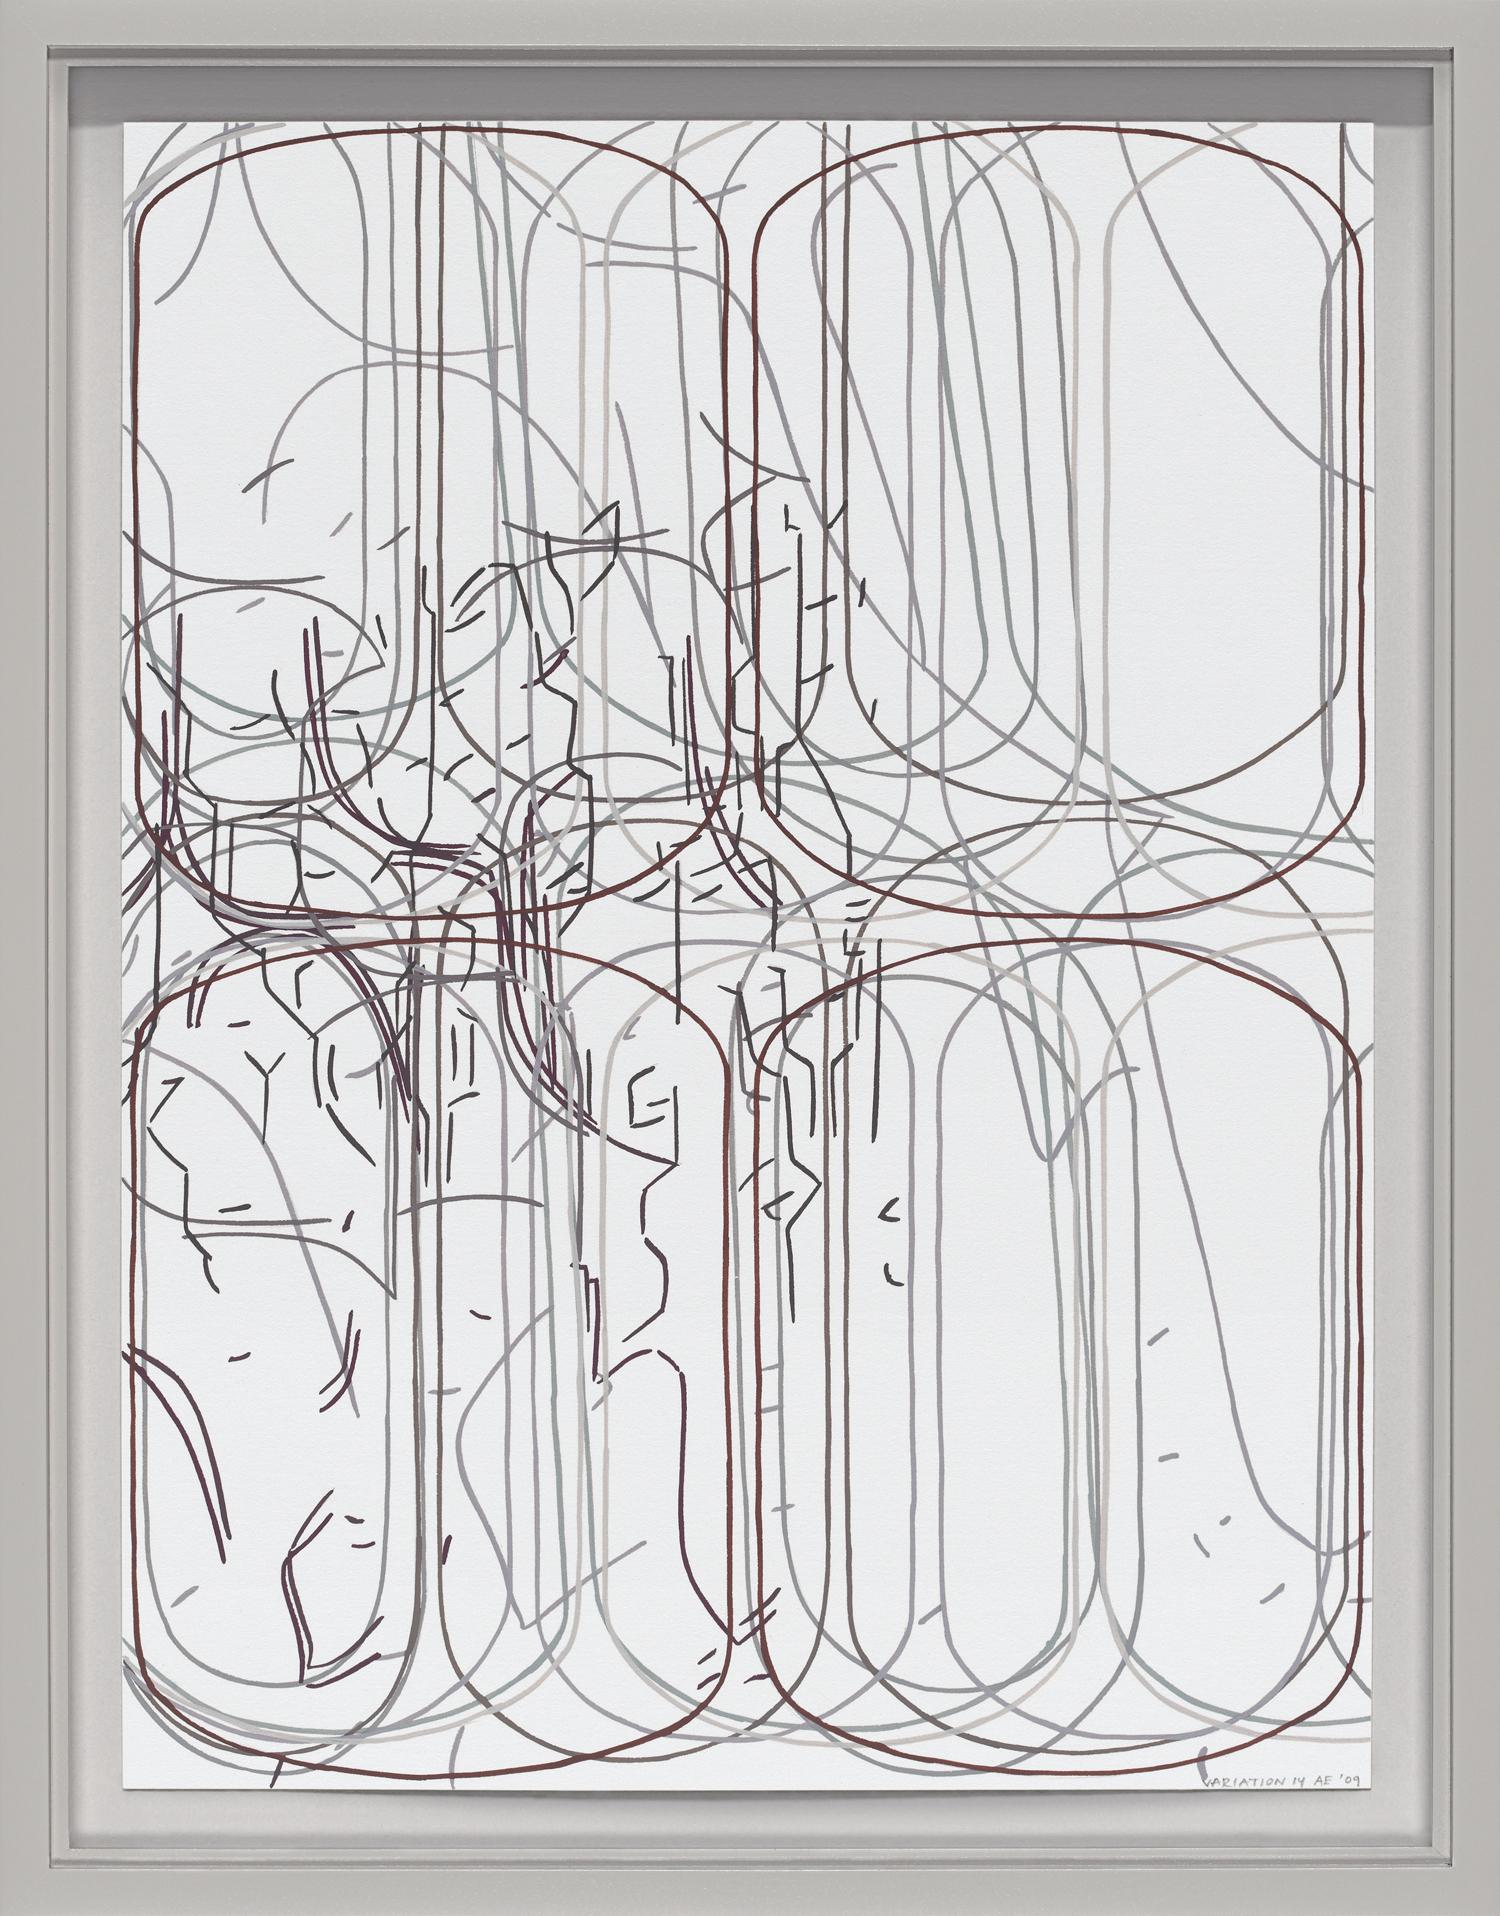 "Variation No. 14, 2011 Gouache on Rising Stonehenge paper 12"" x 9"" (13 ¾"" x 10 ¾"" framed)"